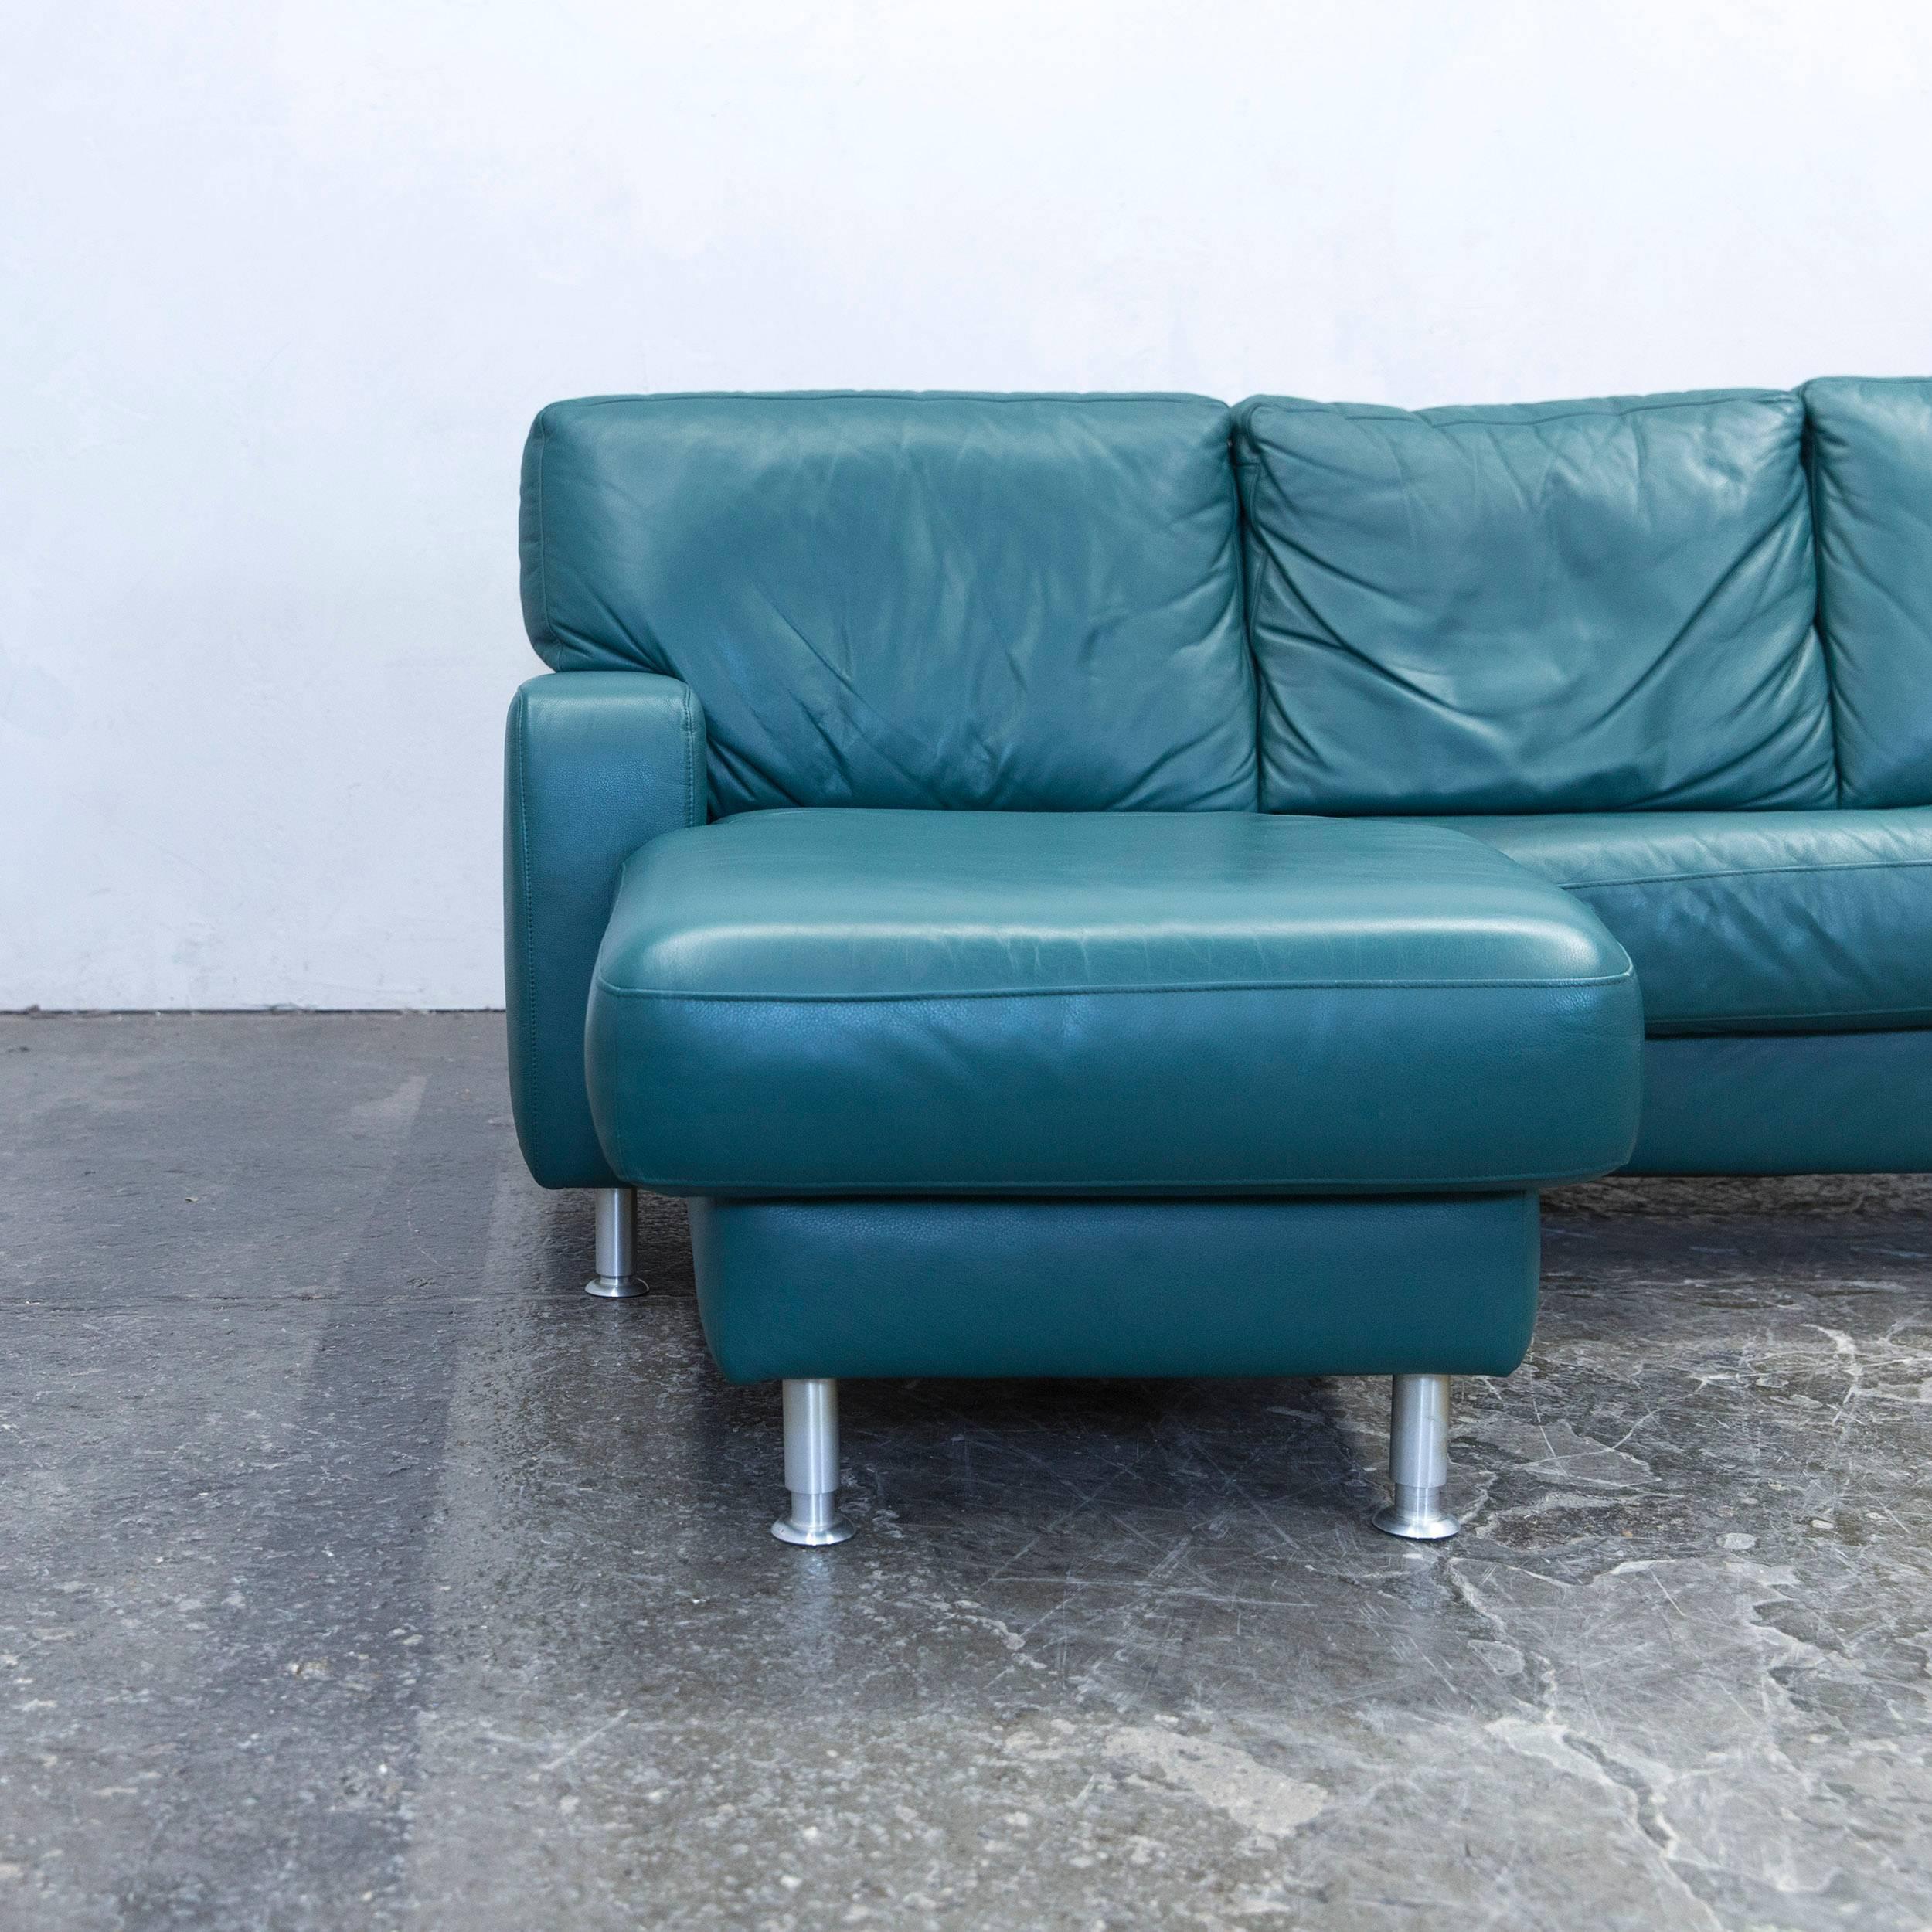 German Koinor Designer Corner Sofa Leather Green Couch Modern For Sale